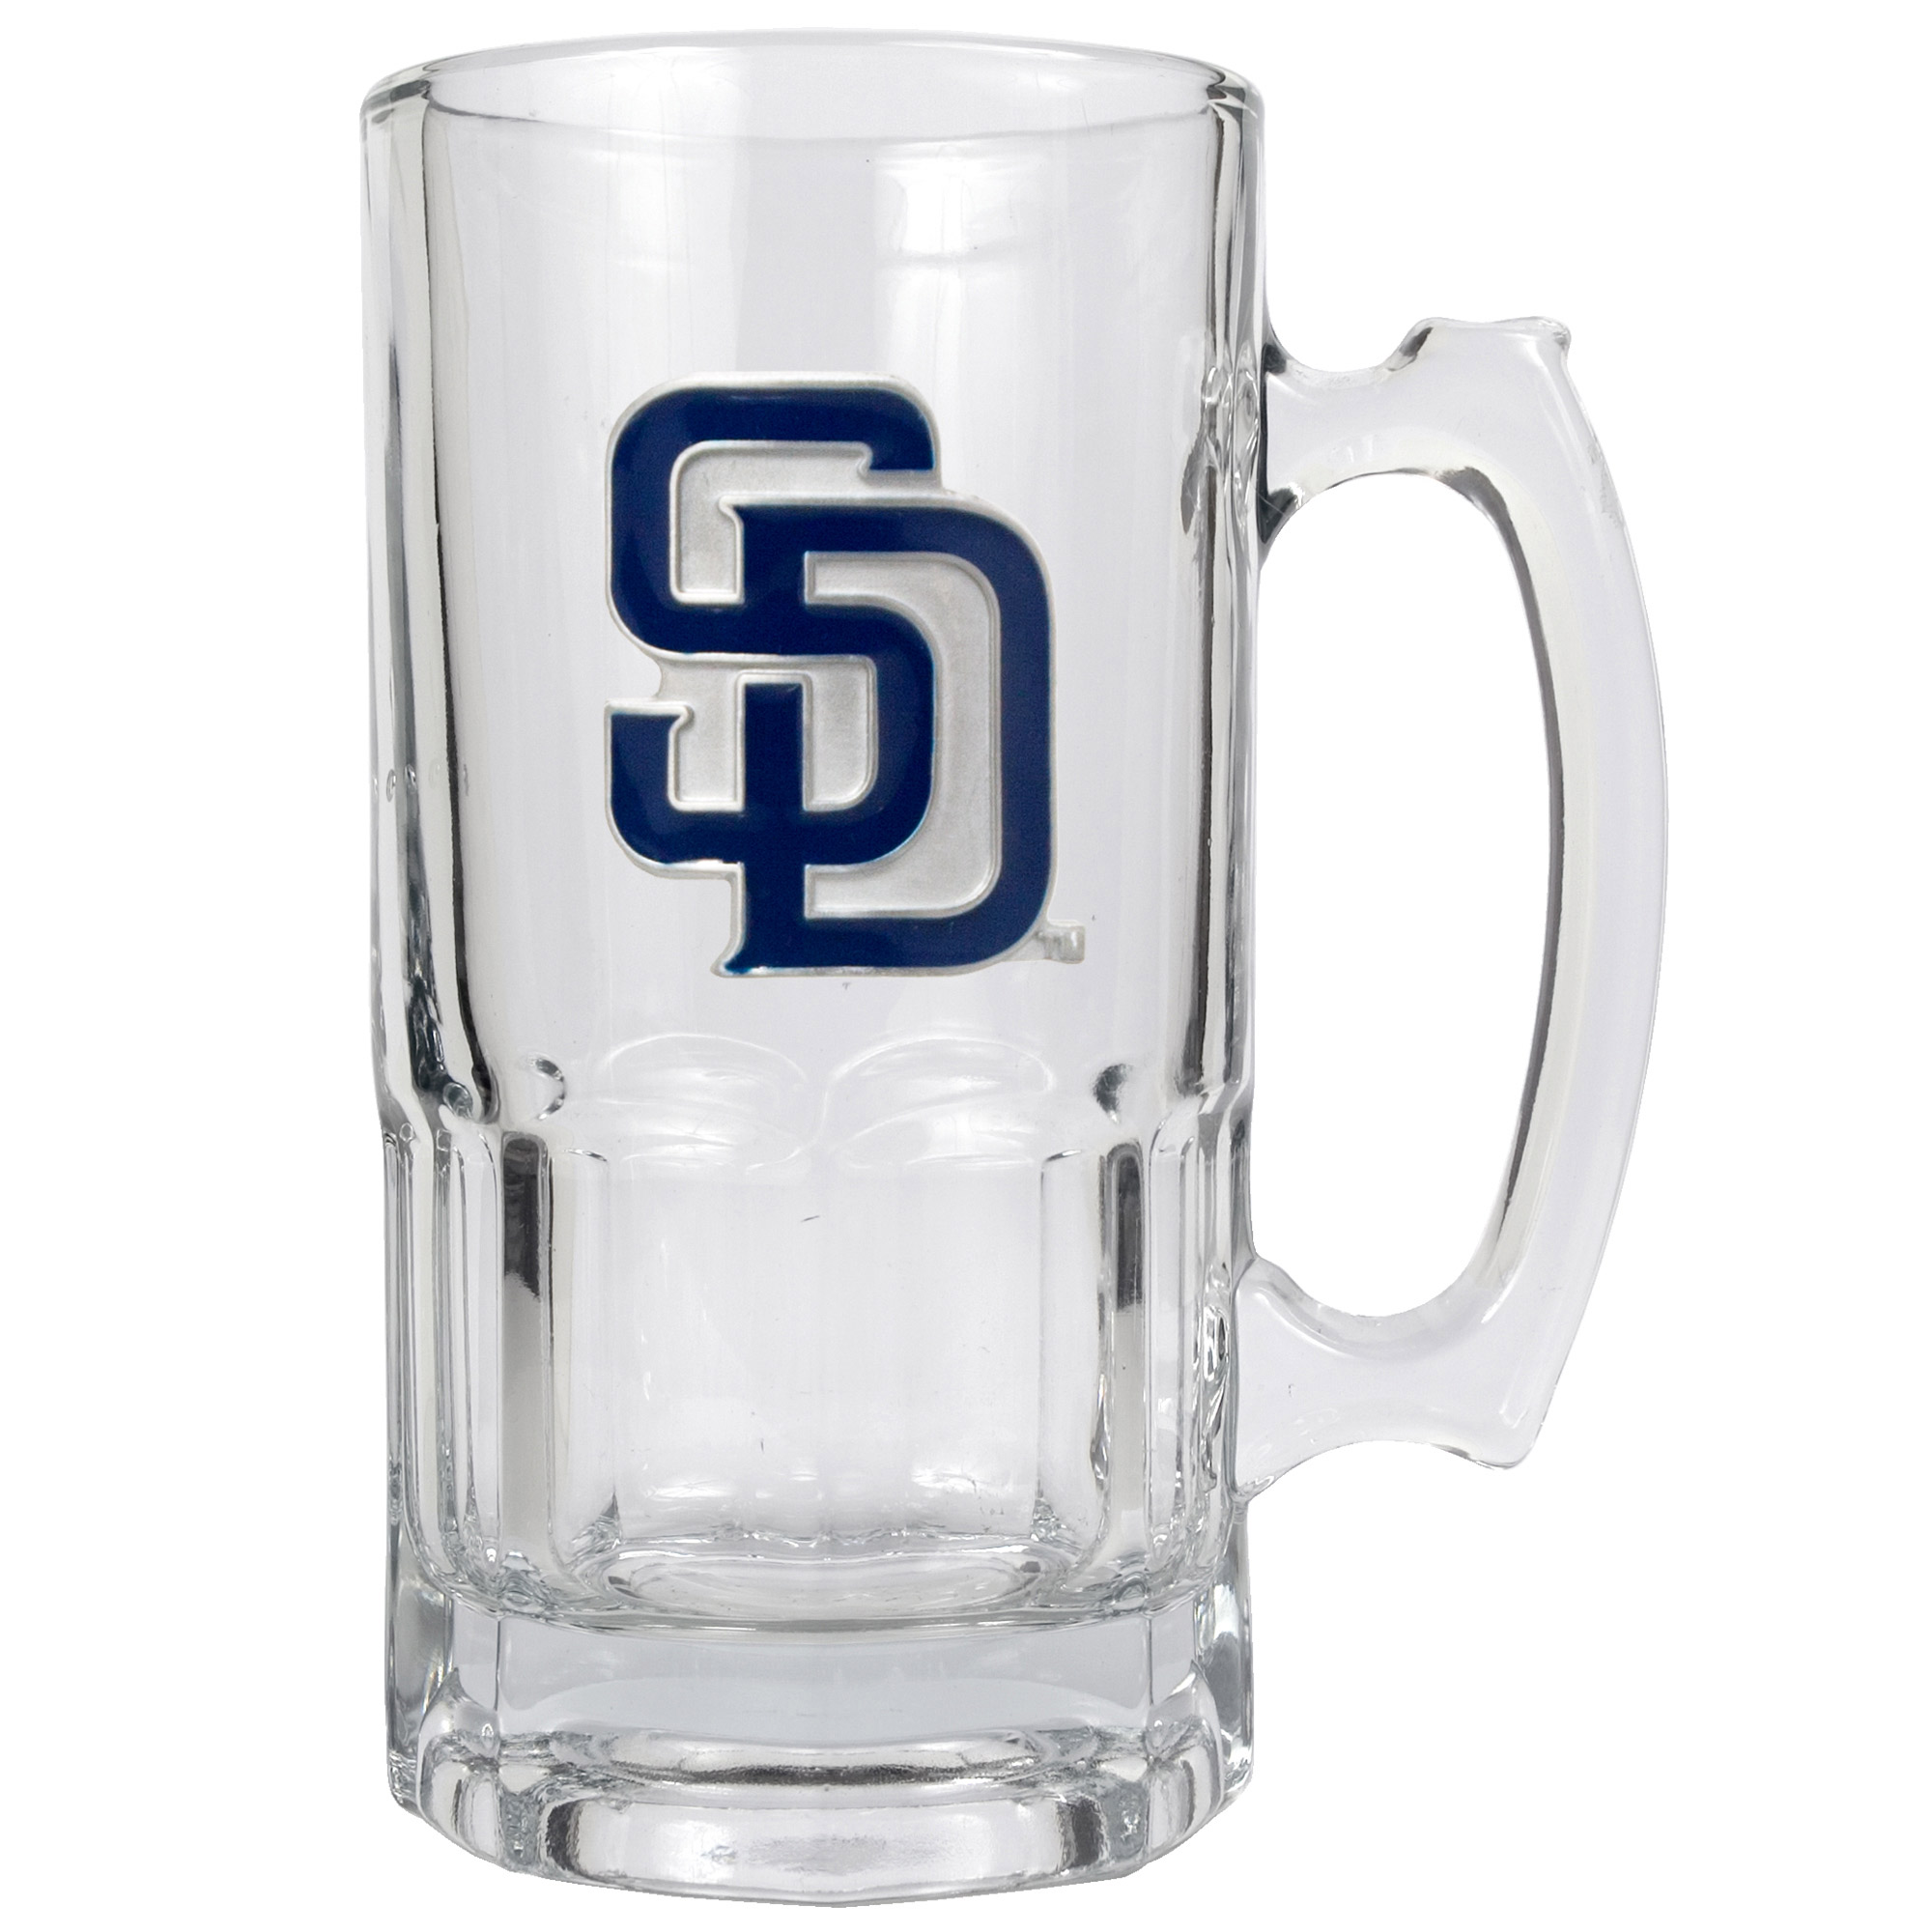 San Diego Padres 32oz. Macho Mug with Handle - No Size